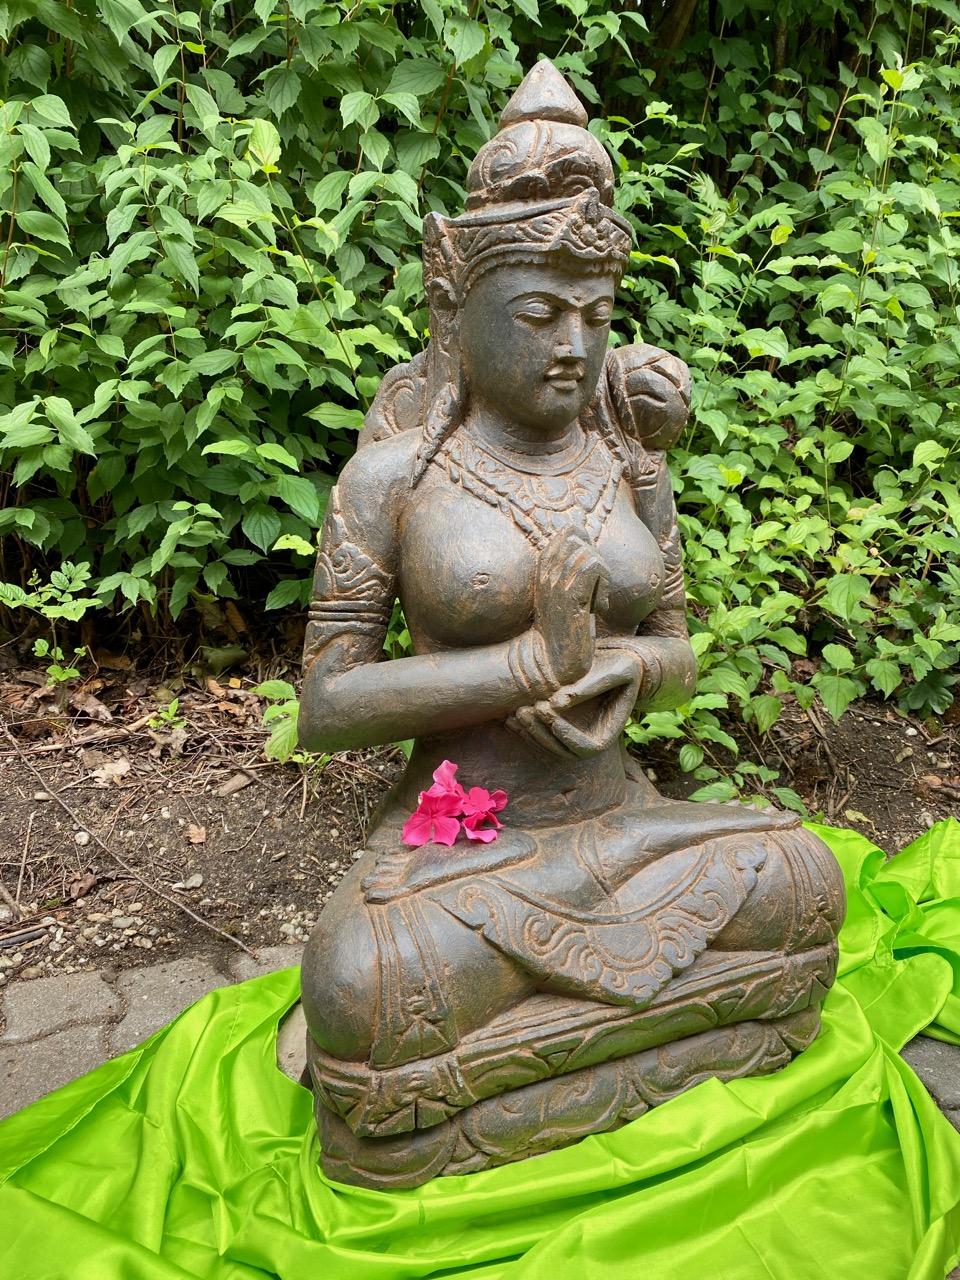 Göttin Dewi Tara Gartenskulptur